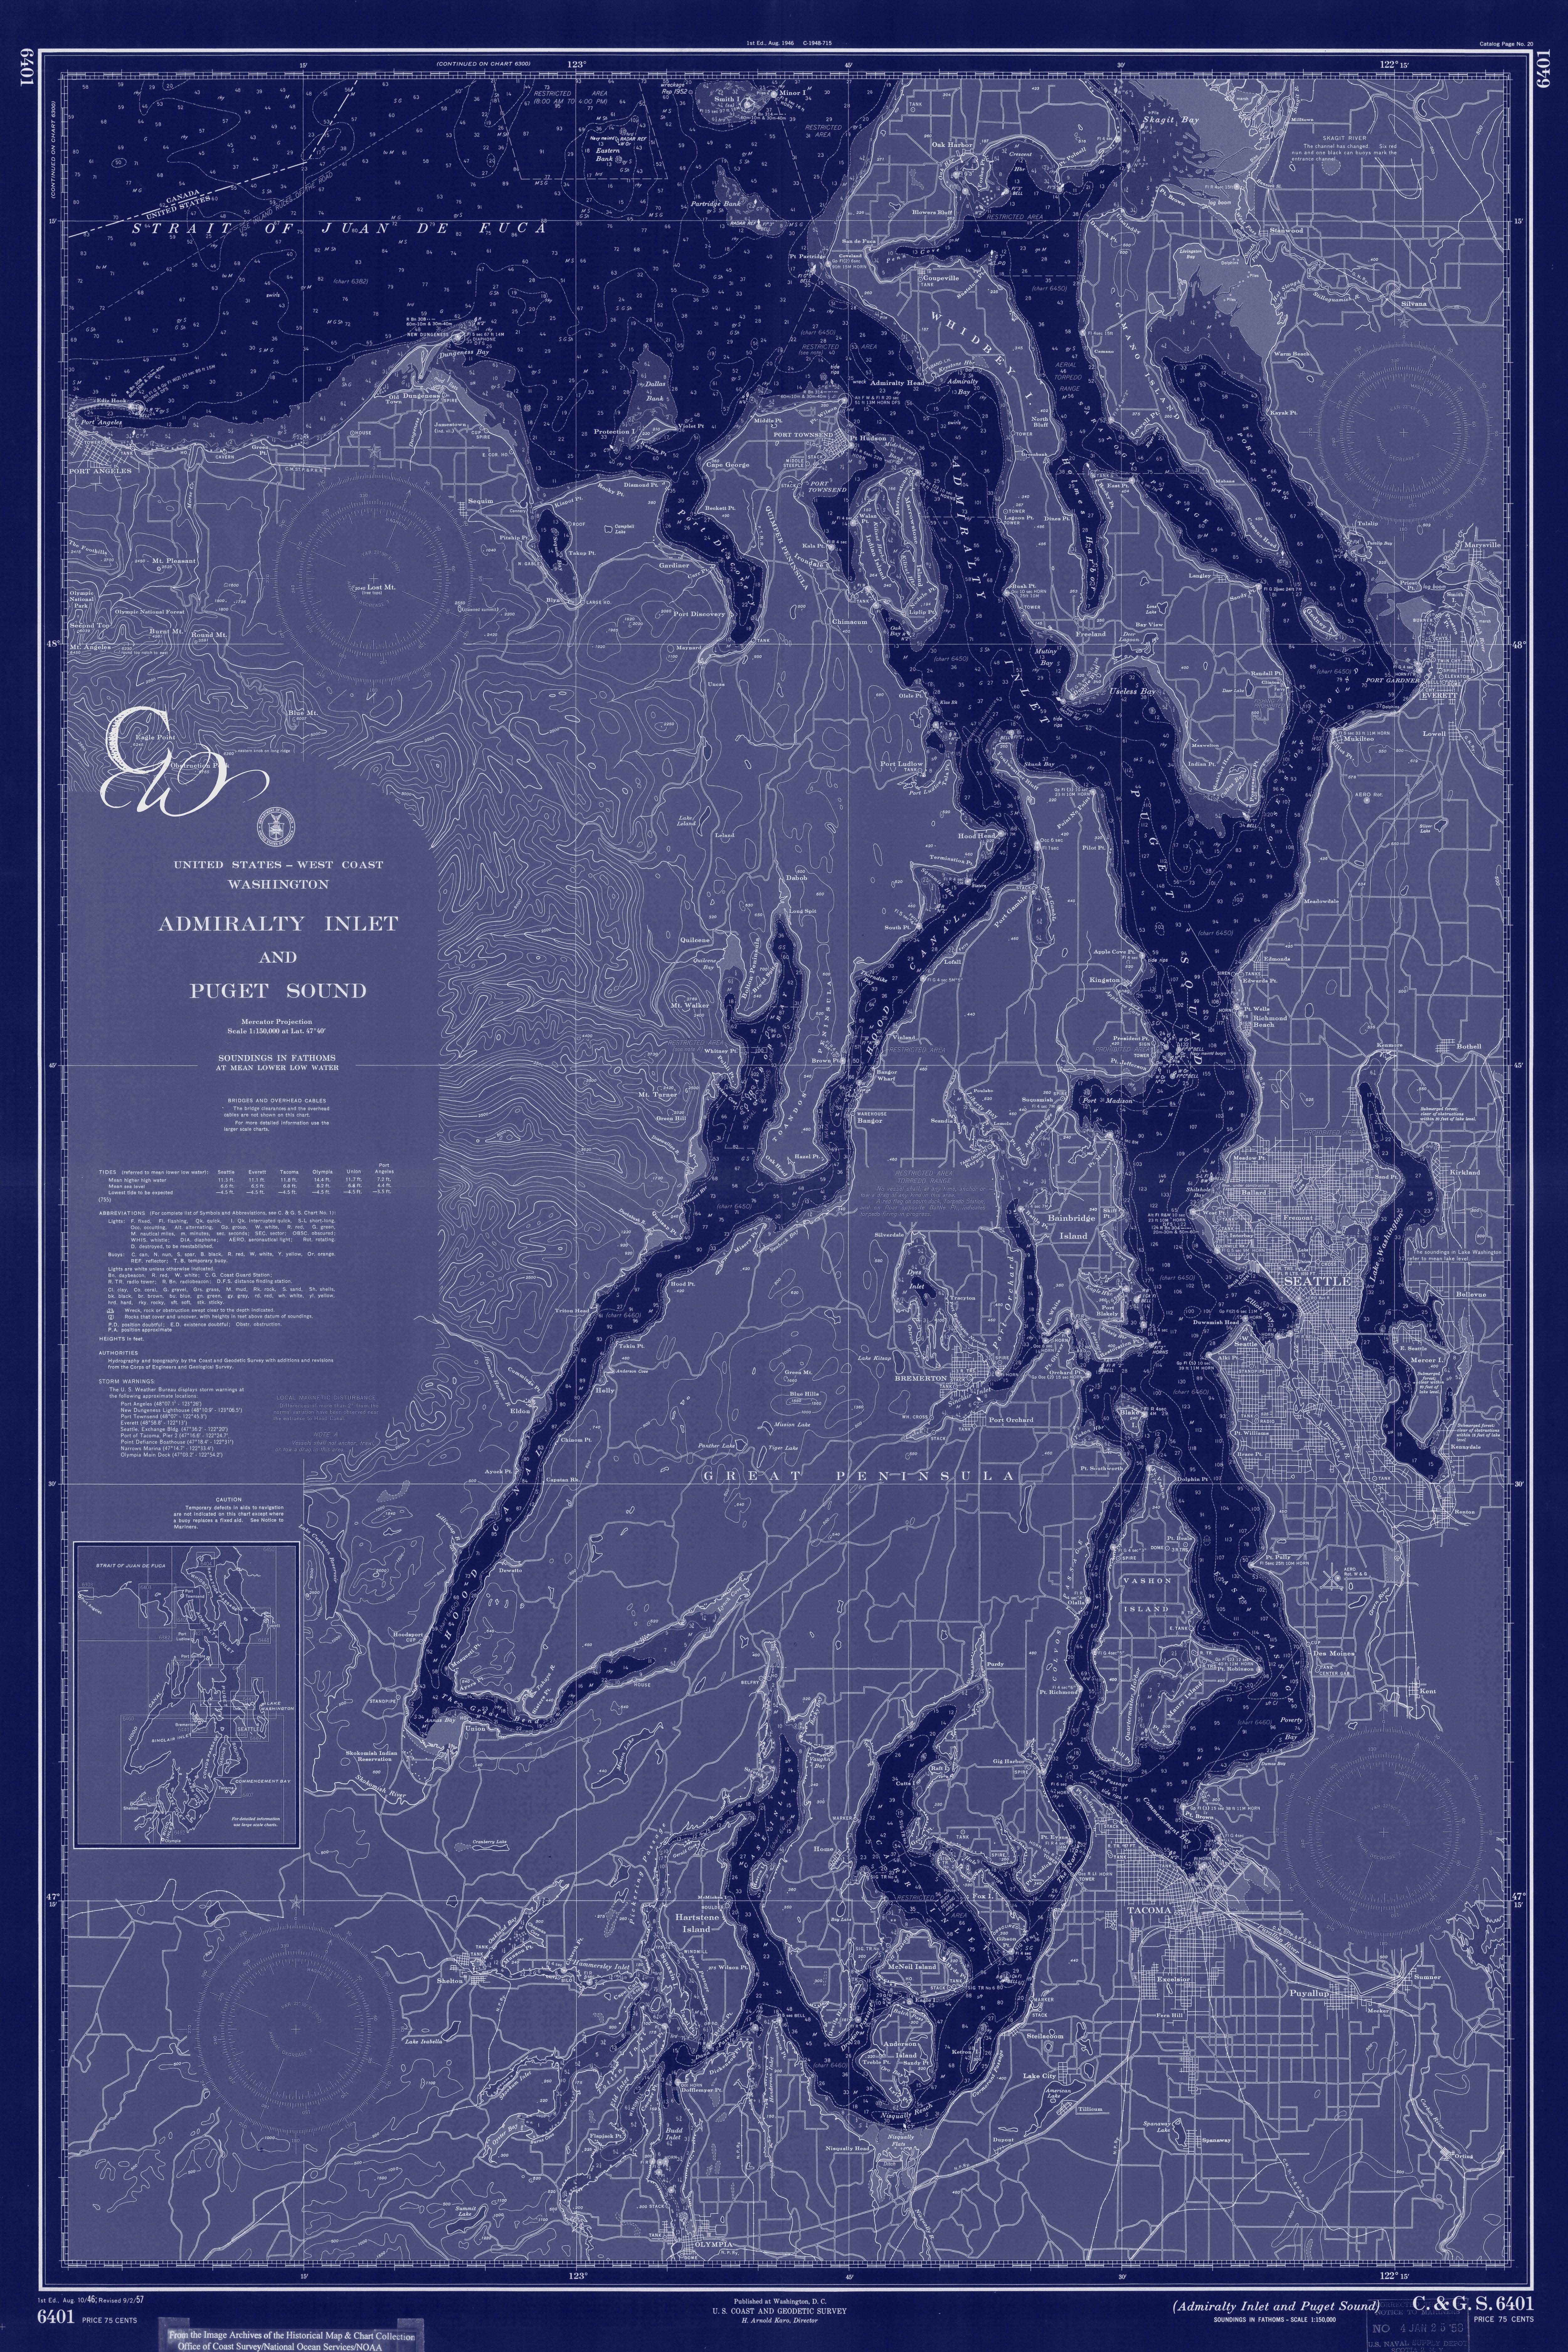 Puget Sound Washington State Nautical Chart Map 1956 Dark Blue DIGITAL PRINT For Download 20 X 30 Art Prints Printable Maps